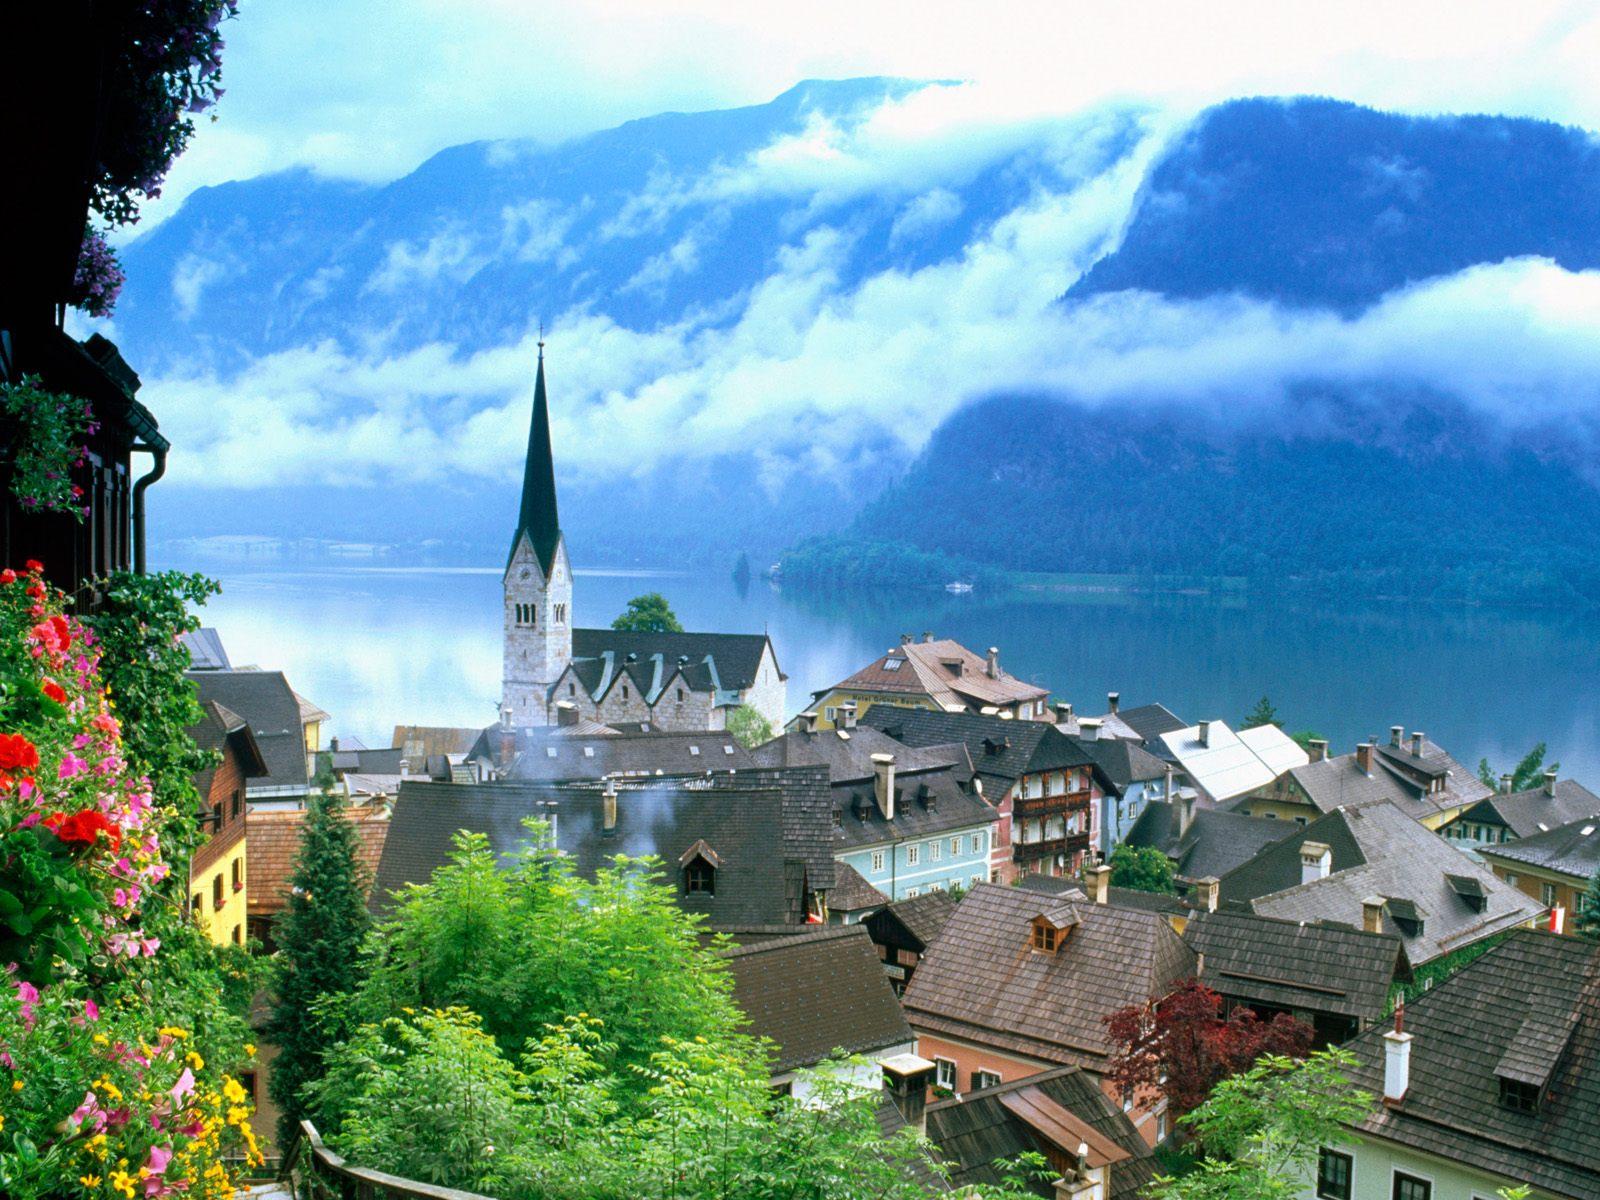 Salzkammergut, Austria  № 7740  скачать